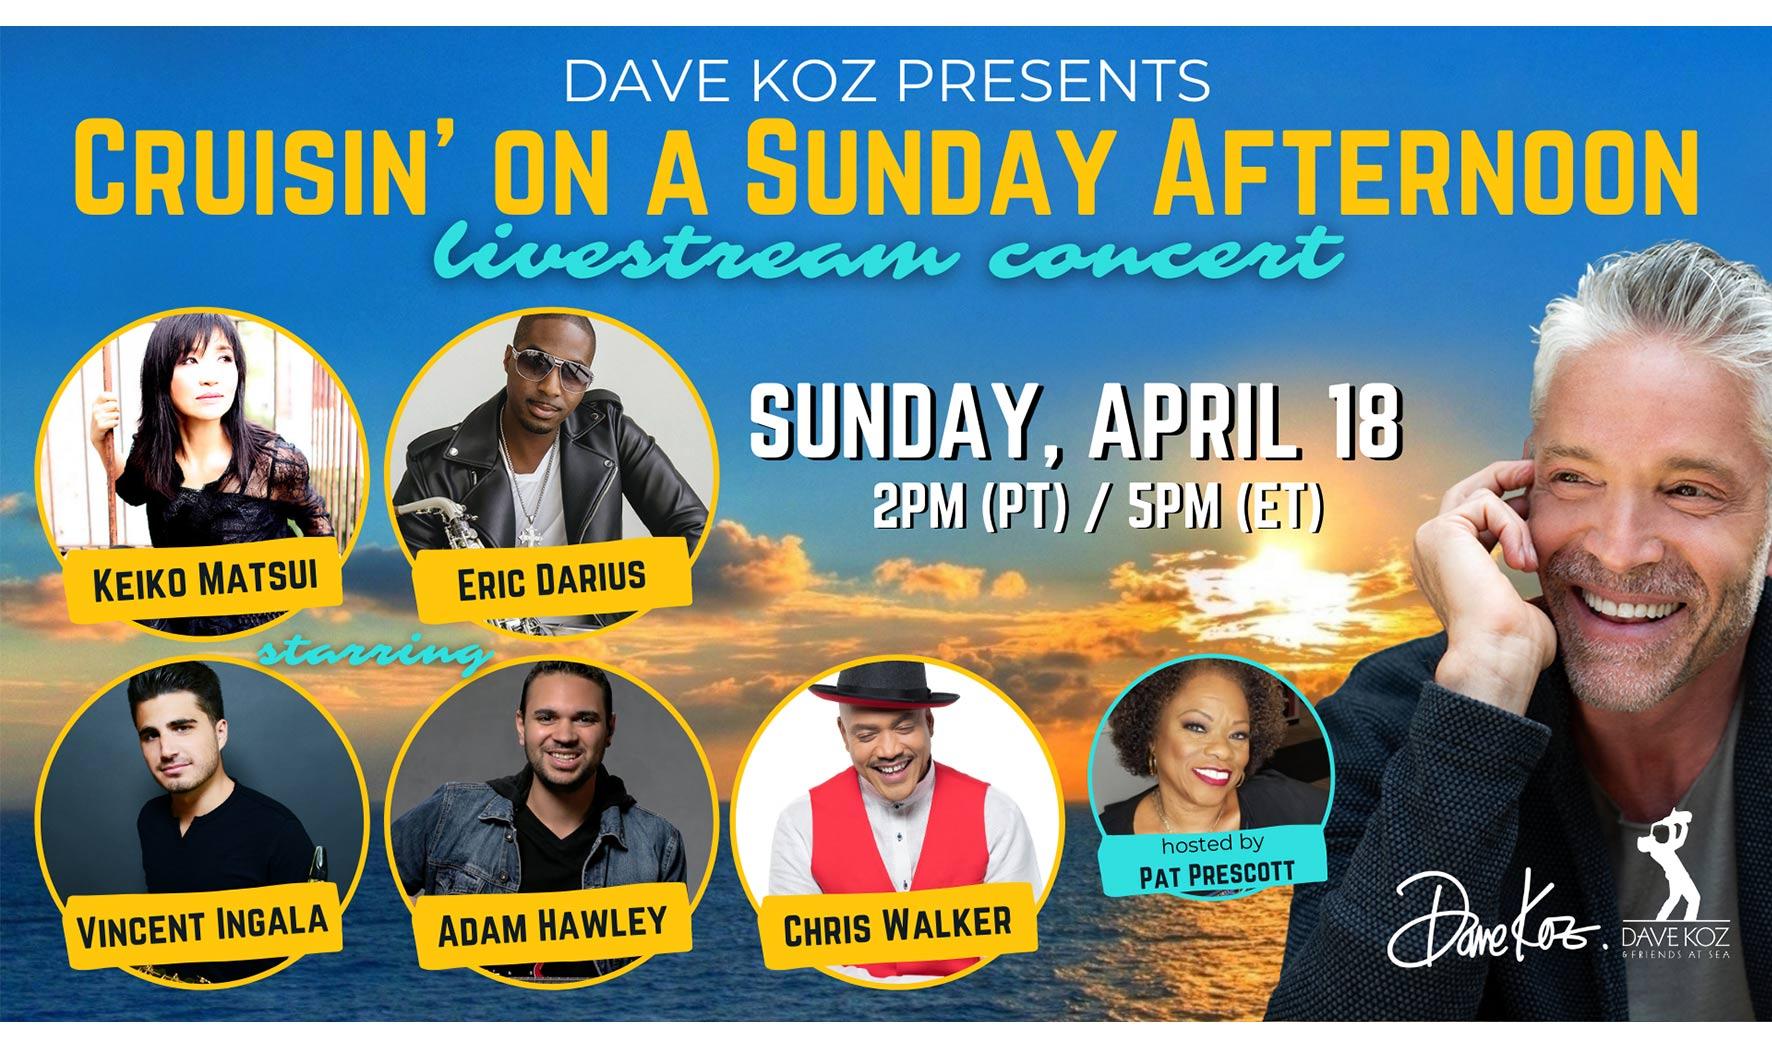 Dave Koz presents Cruisin' on a Sunday Afternoon